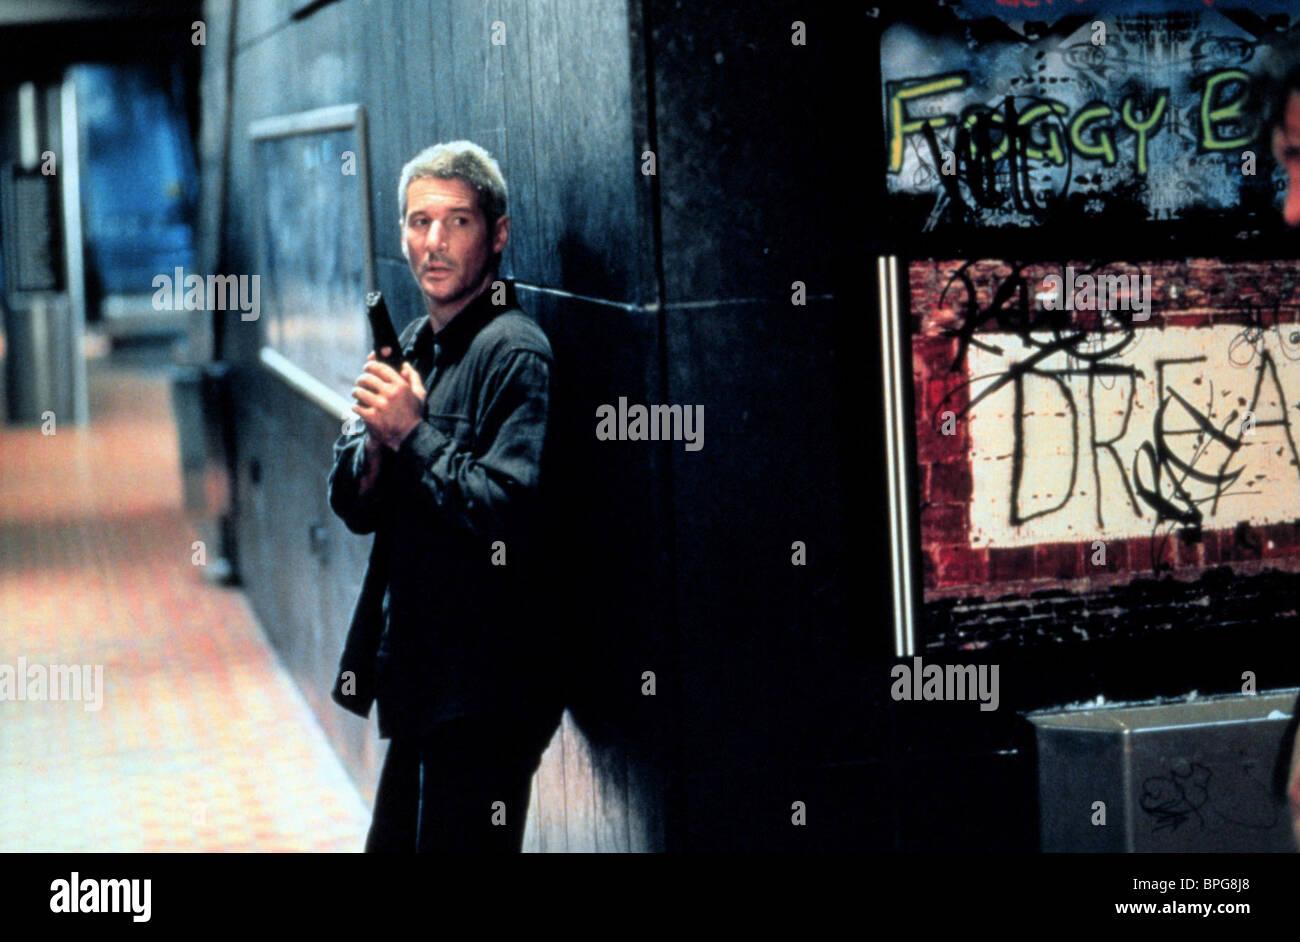 Jackal 1997